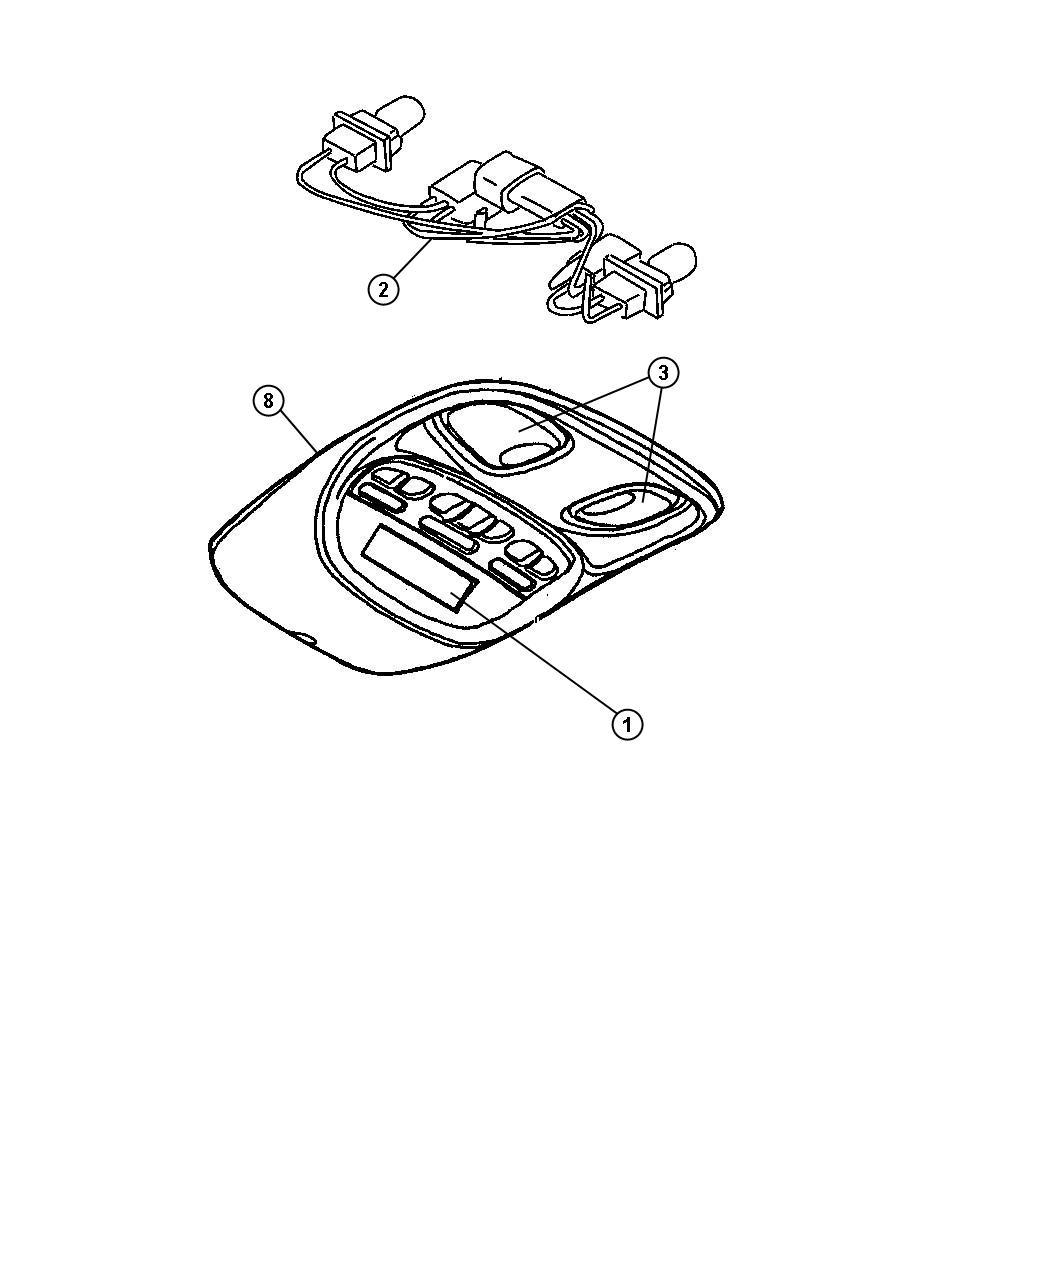 Dodge Ram 2500 Wiring. Overhead console. Trim: [all trim